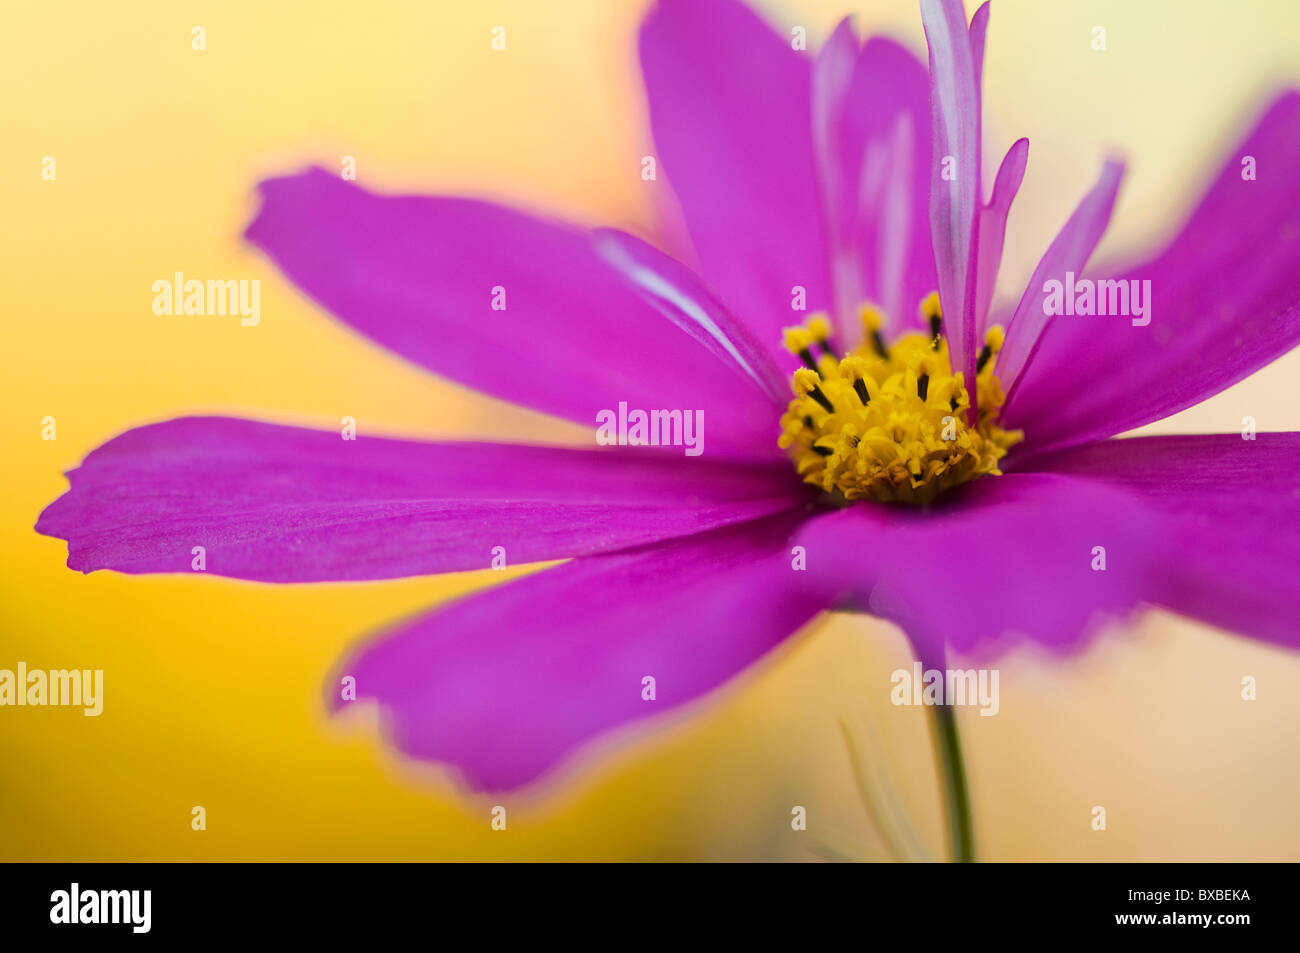 A single vibrant pink Cosmos sonata flower - Stock Image